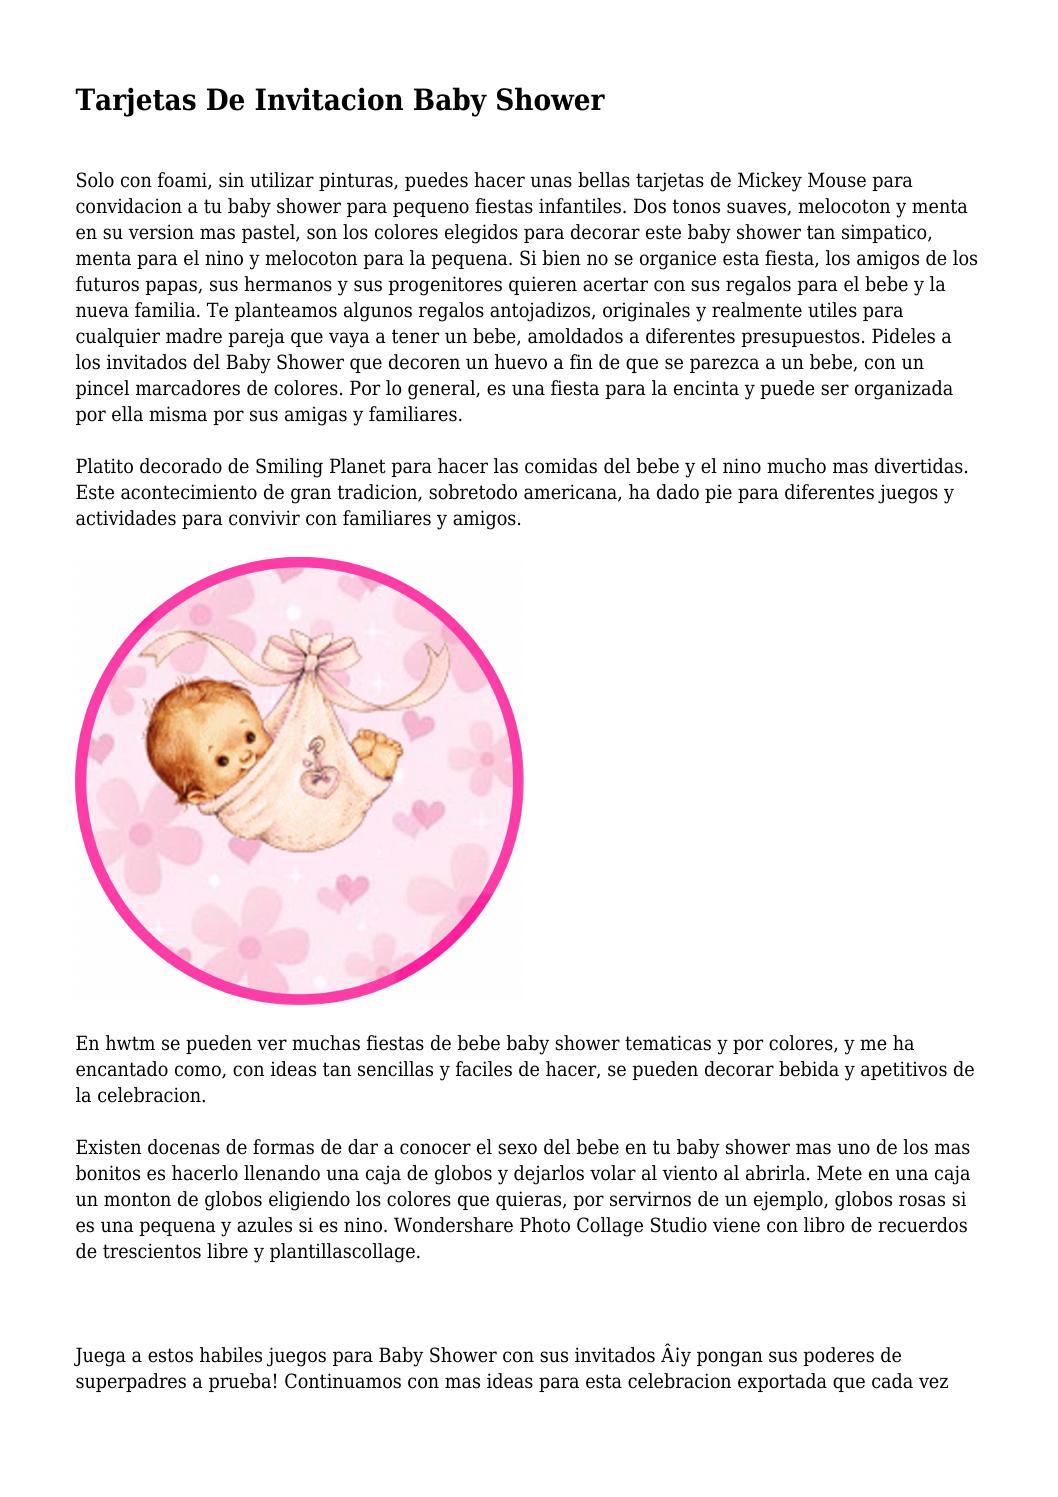 Tarjetas De Invitacion Baby Shower By Internalmystiqu68 Issuu